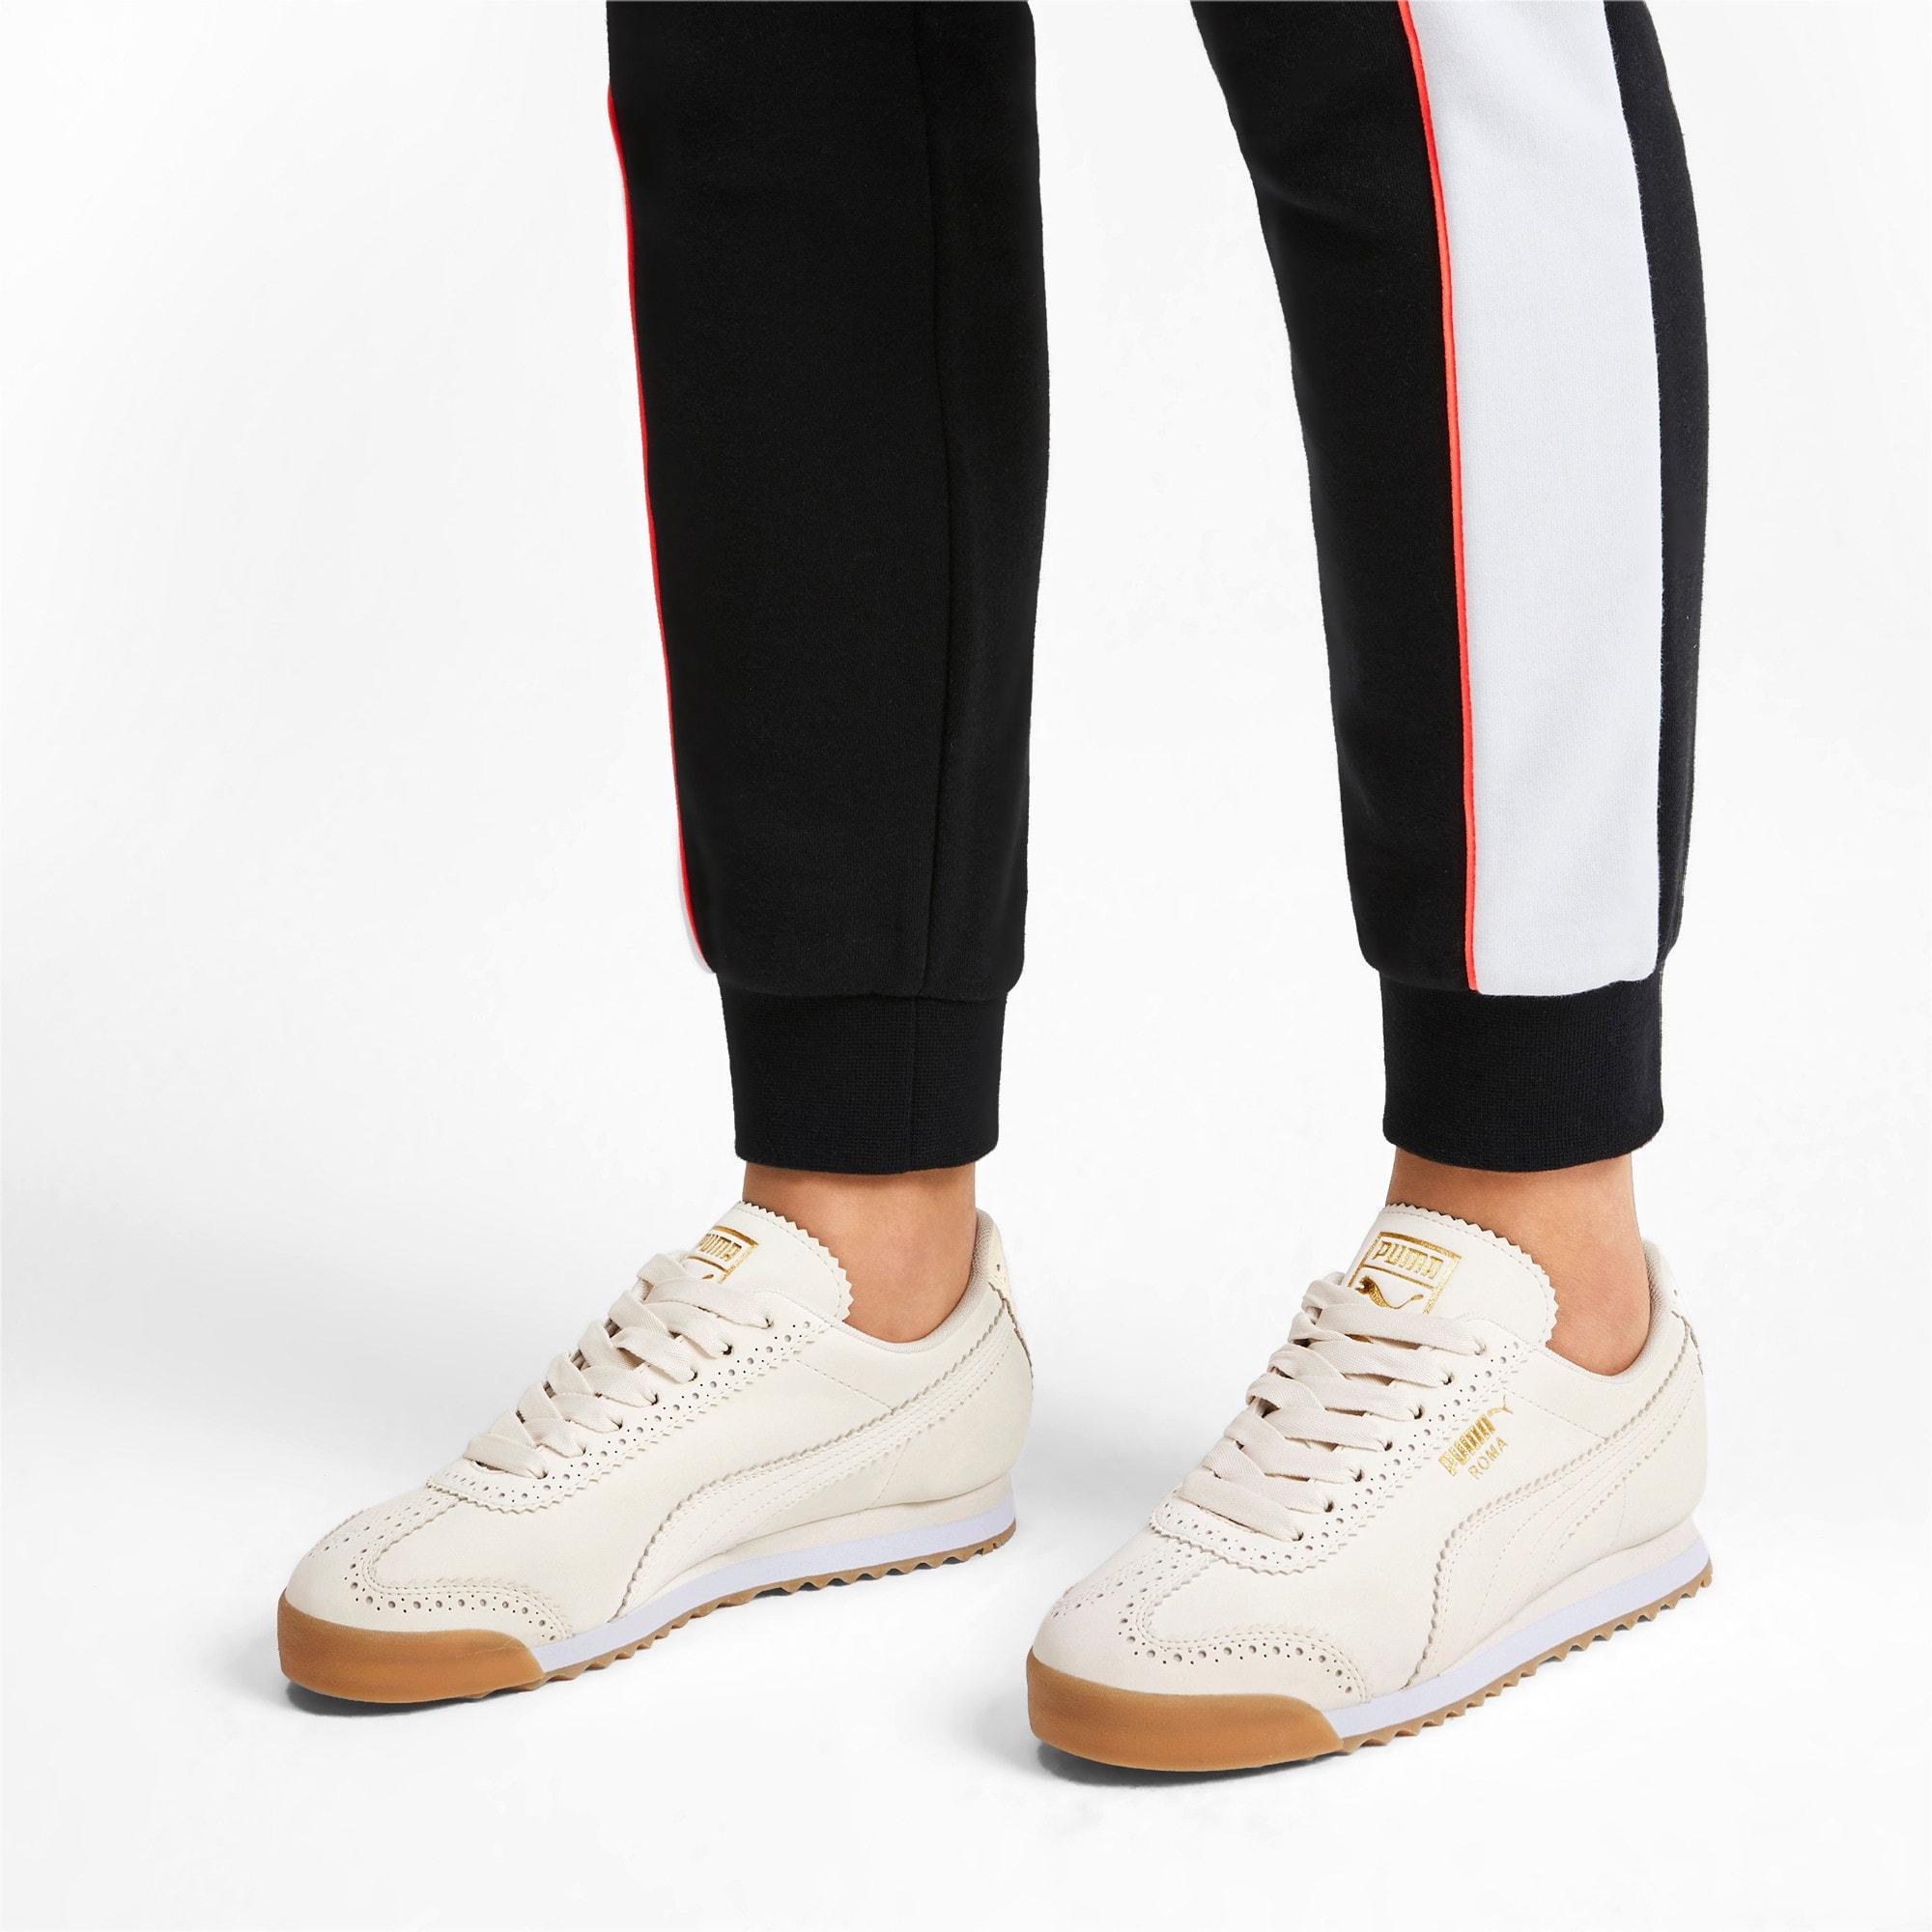 Thumbnail 3 of Roma Brogue Women's Sneakers, Pastel Parchment-P.Team Gold, medium